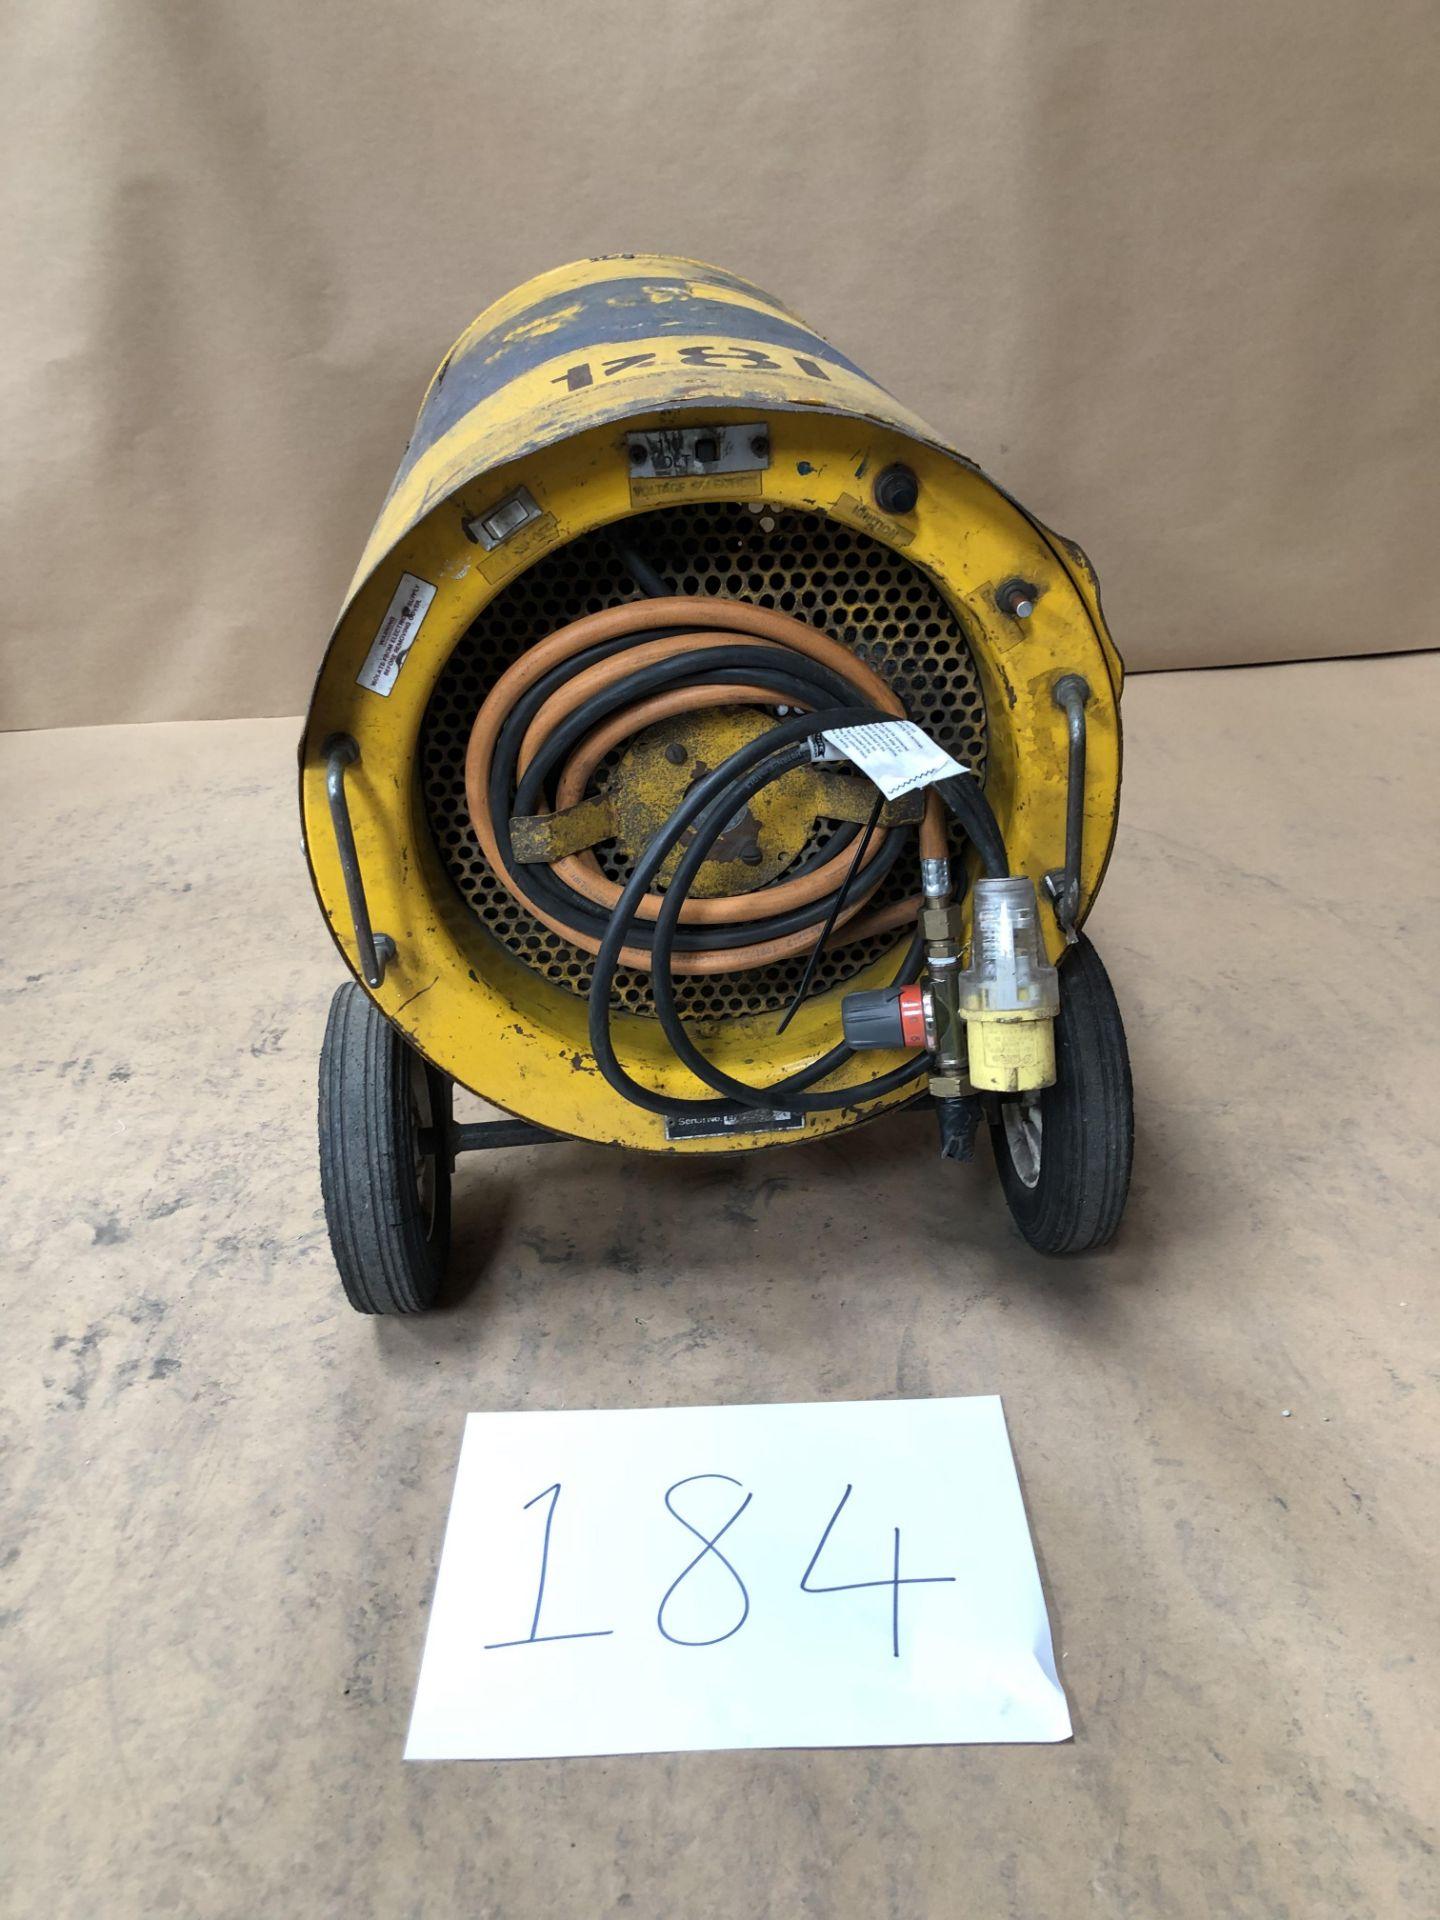 Easyheater 275 Propane Heater - Image 3 of 5